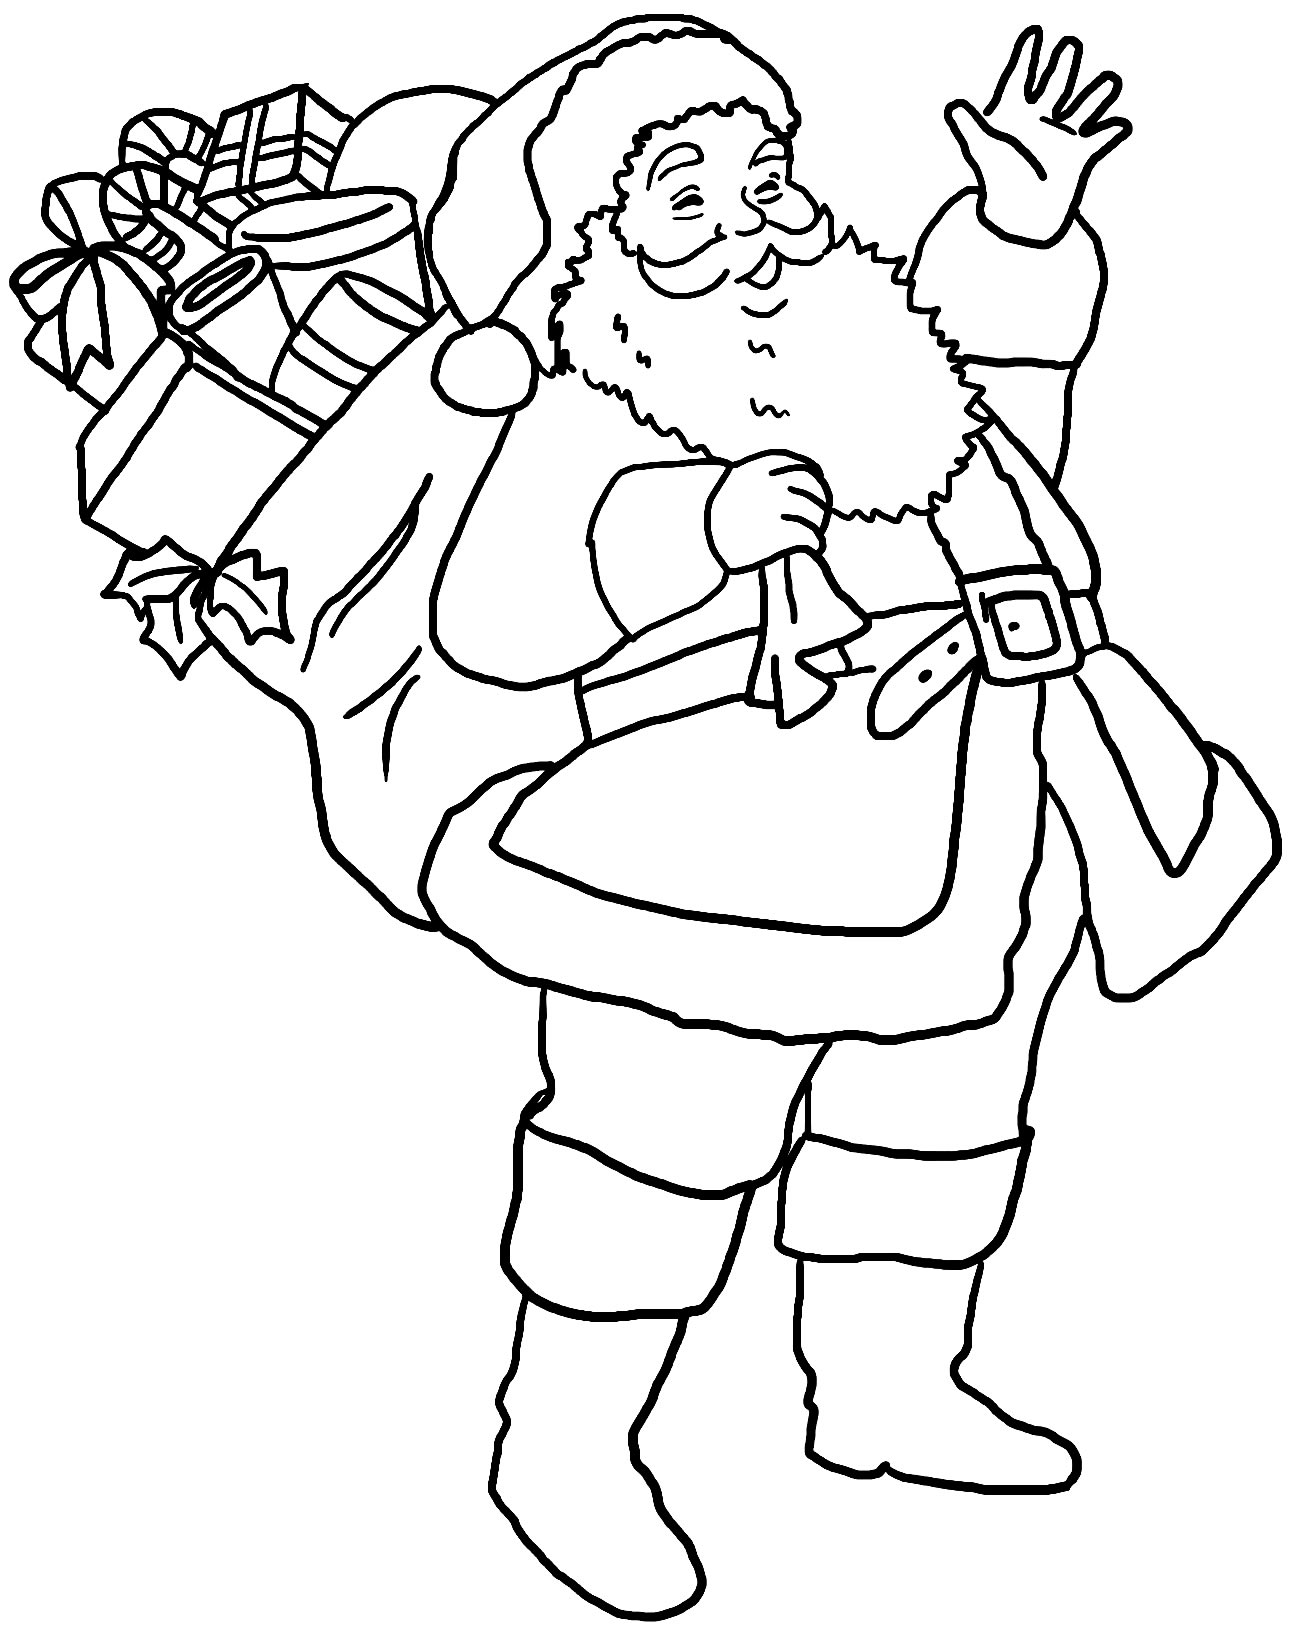 Desenho fofo do Papai Noel para pintar